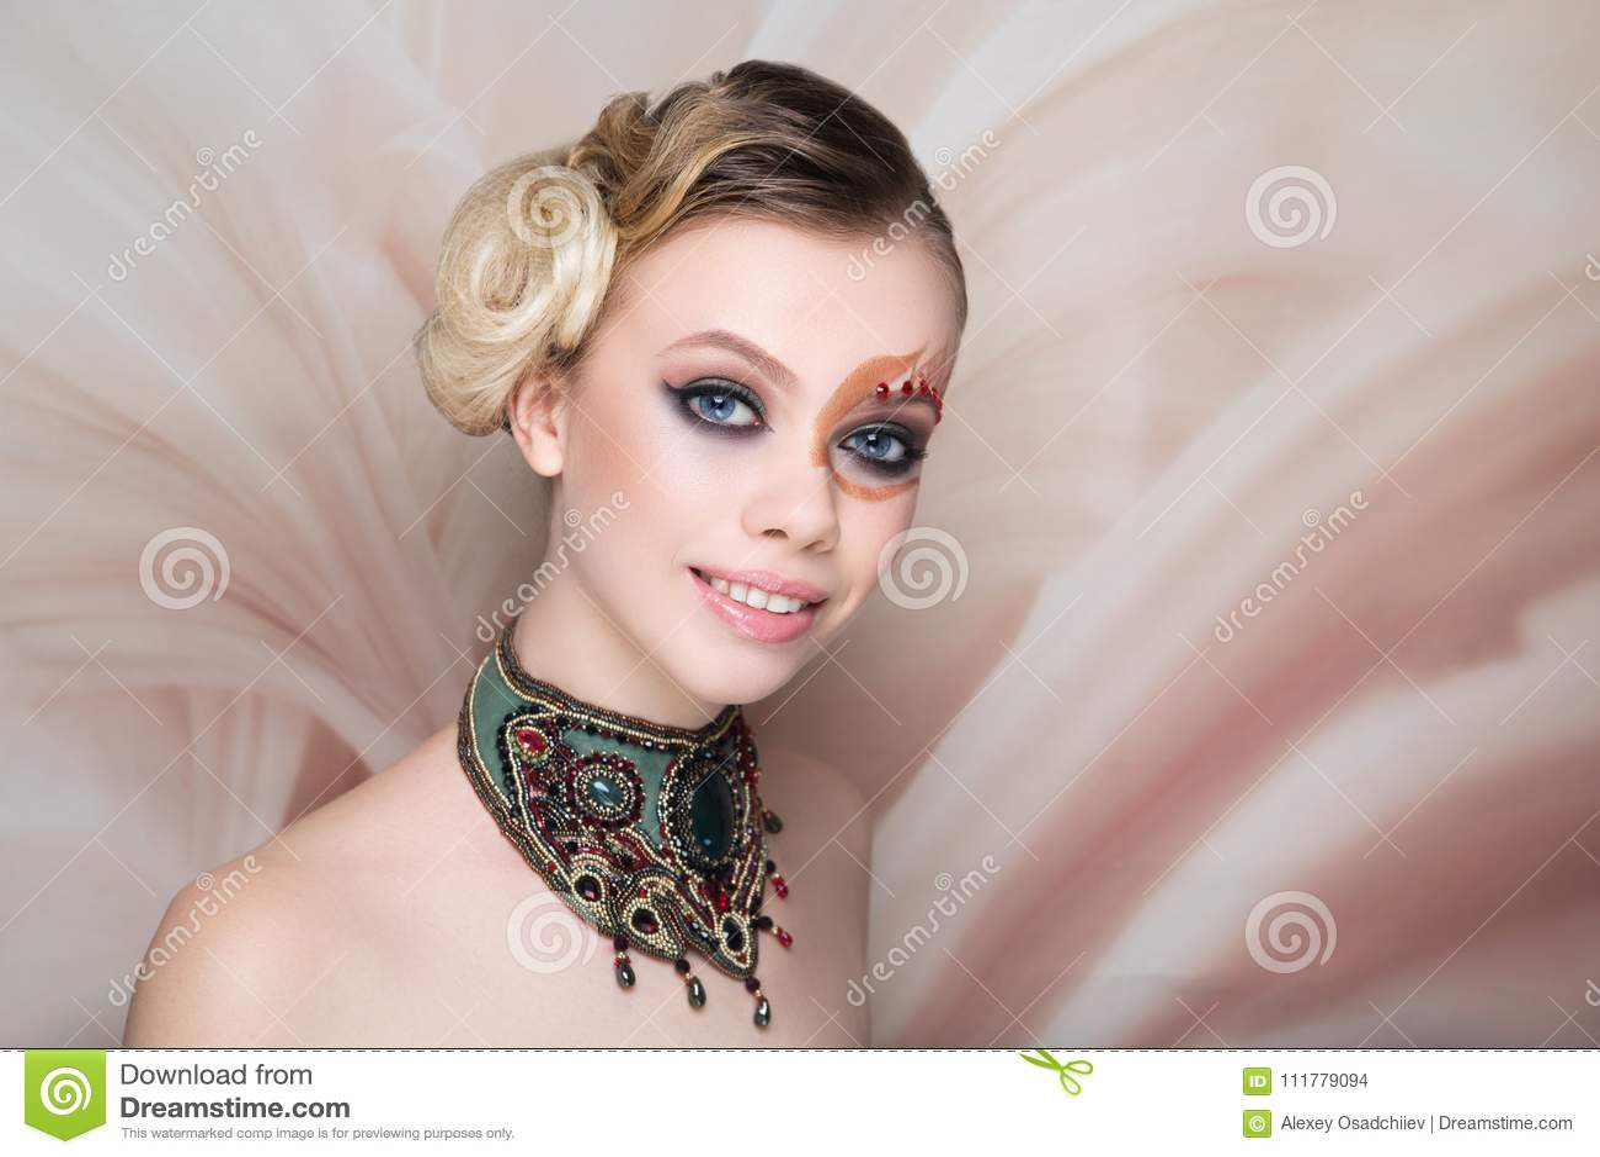 Woman beauty face art make up